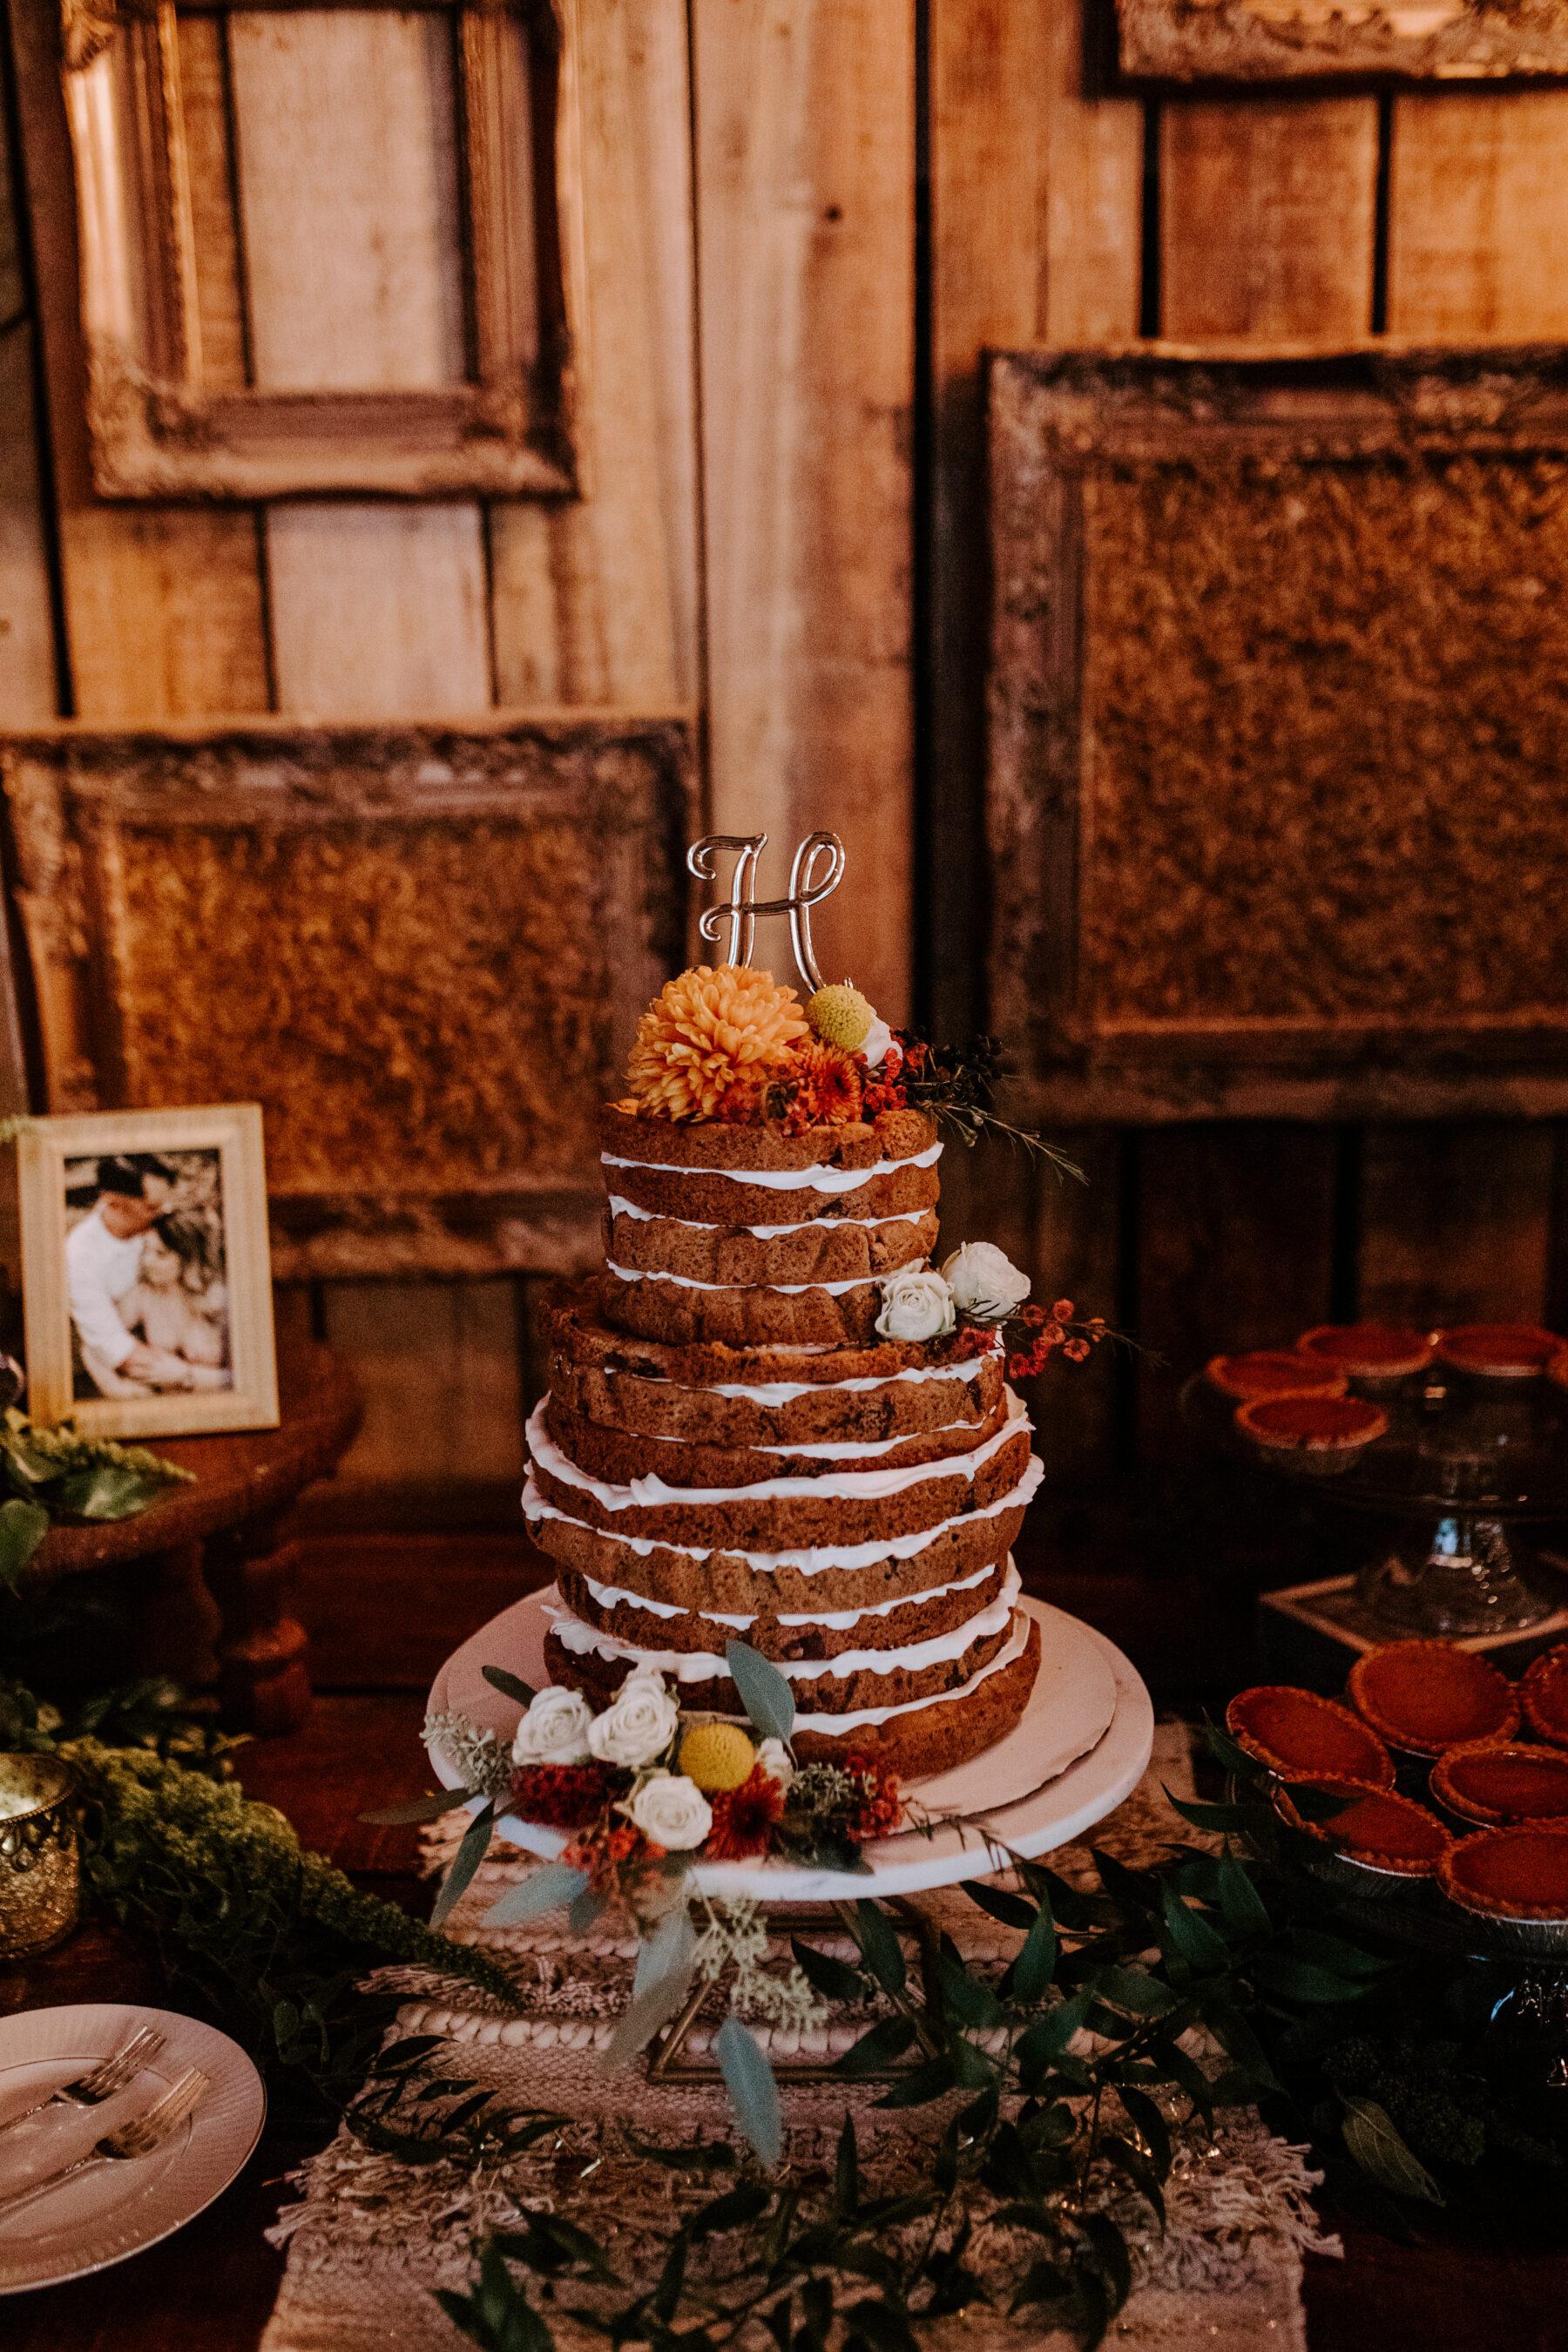 Cookie cake wedding cake design